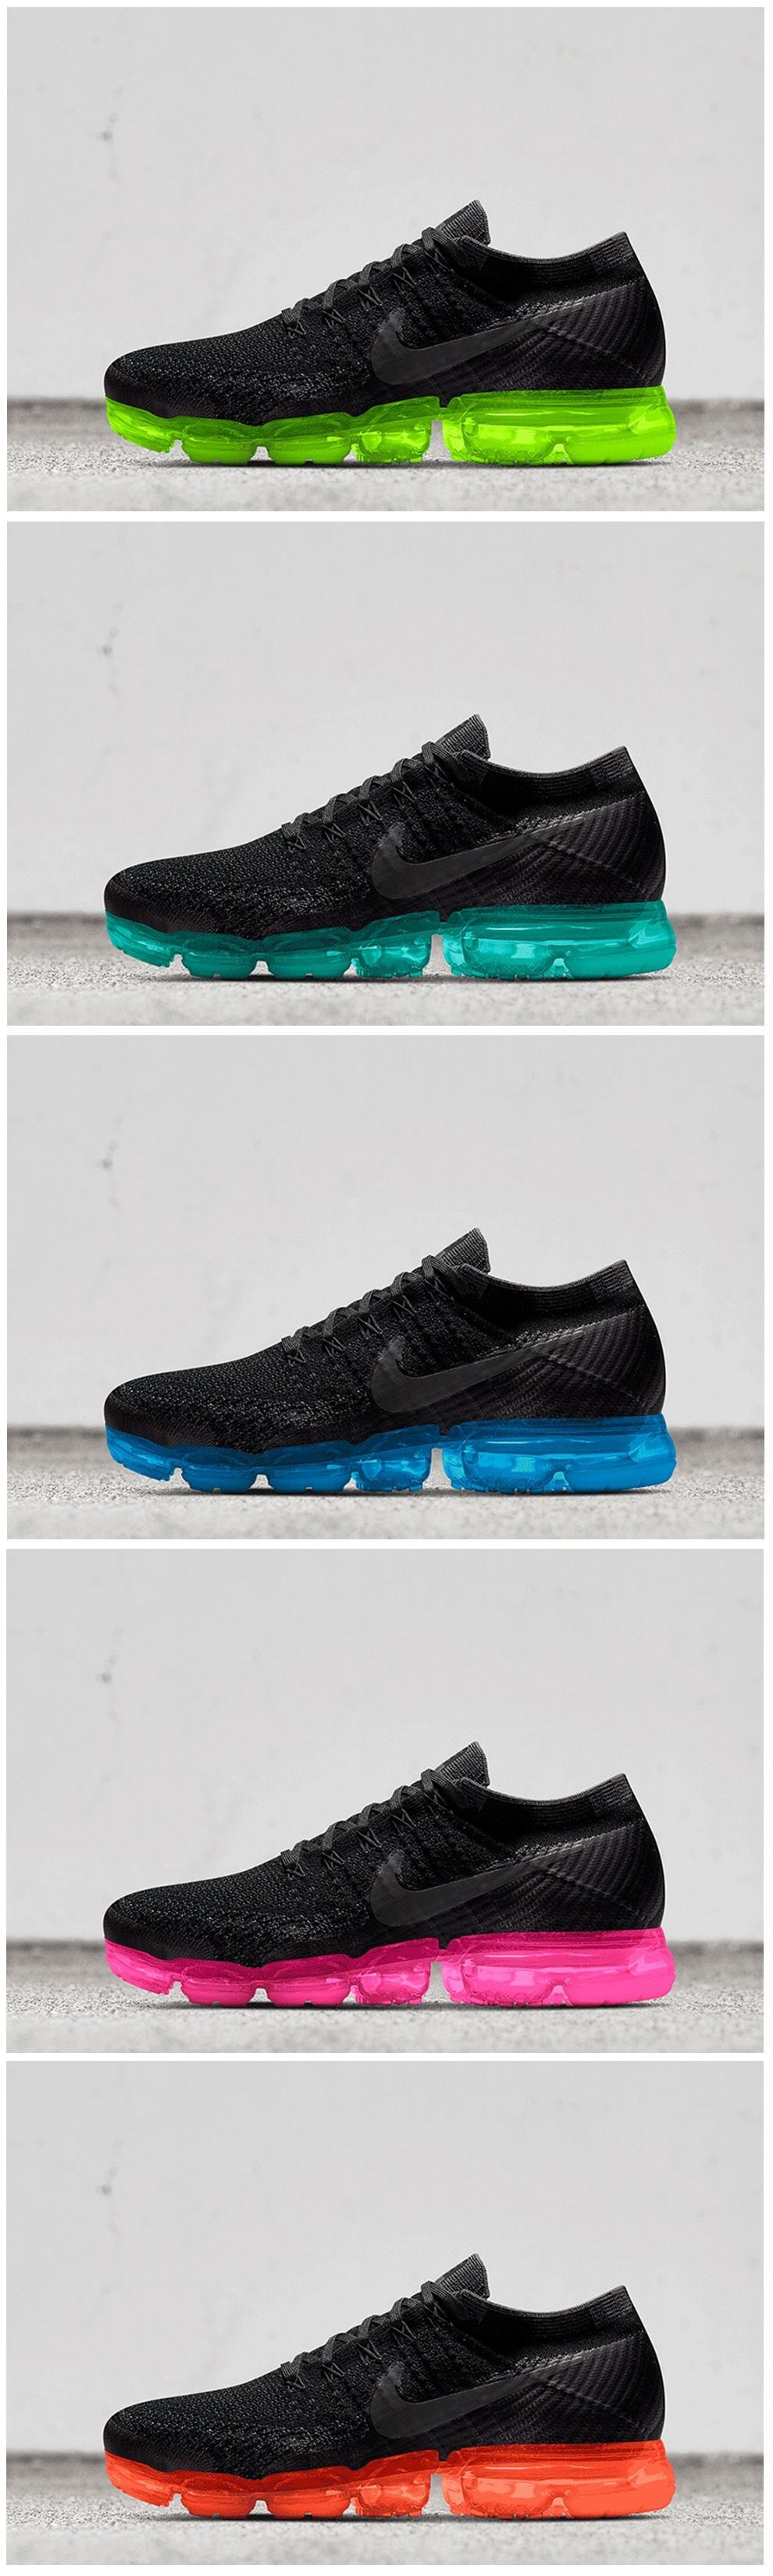 Nike Air VaporMax Flyknit Femei Pantofi alergare Negru/Albastru Y4675m